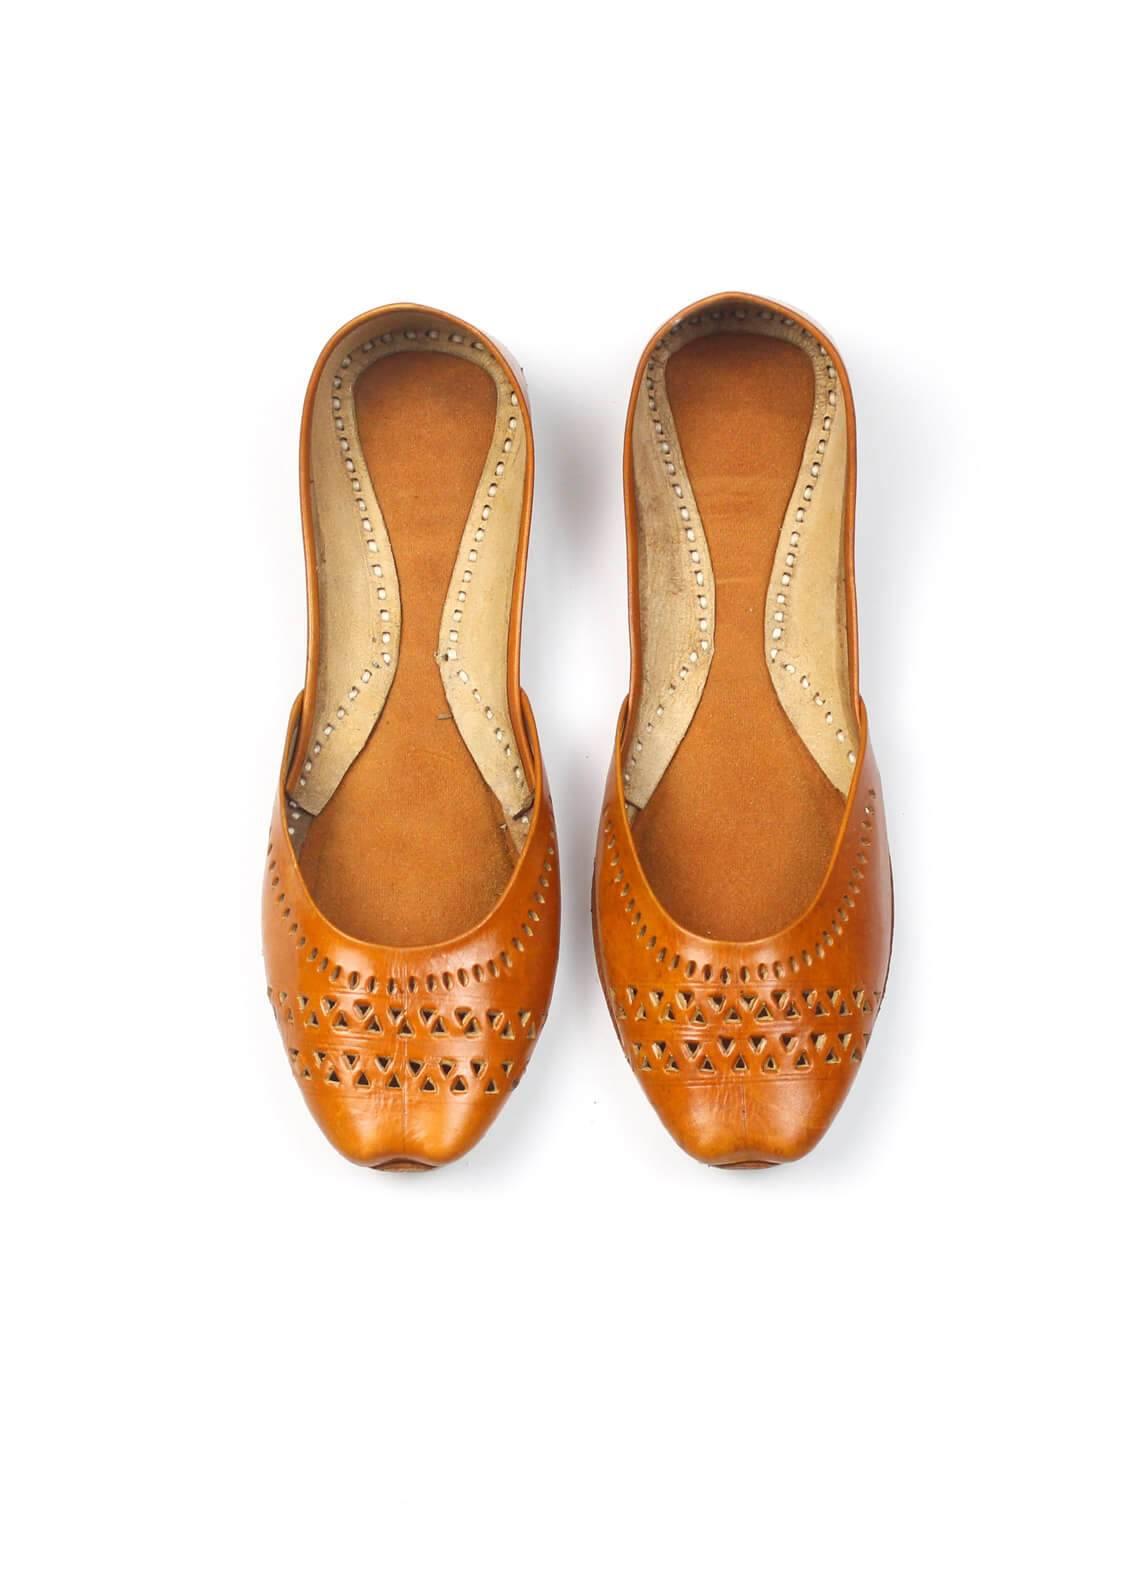 Silk Avenue Cutwork Style Khussa Leather SAF019-Brown